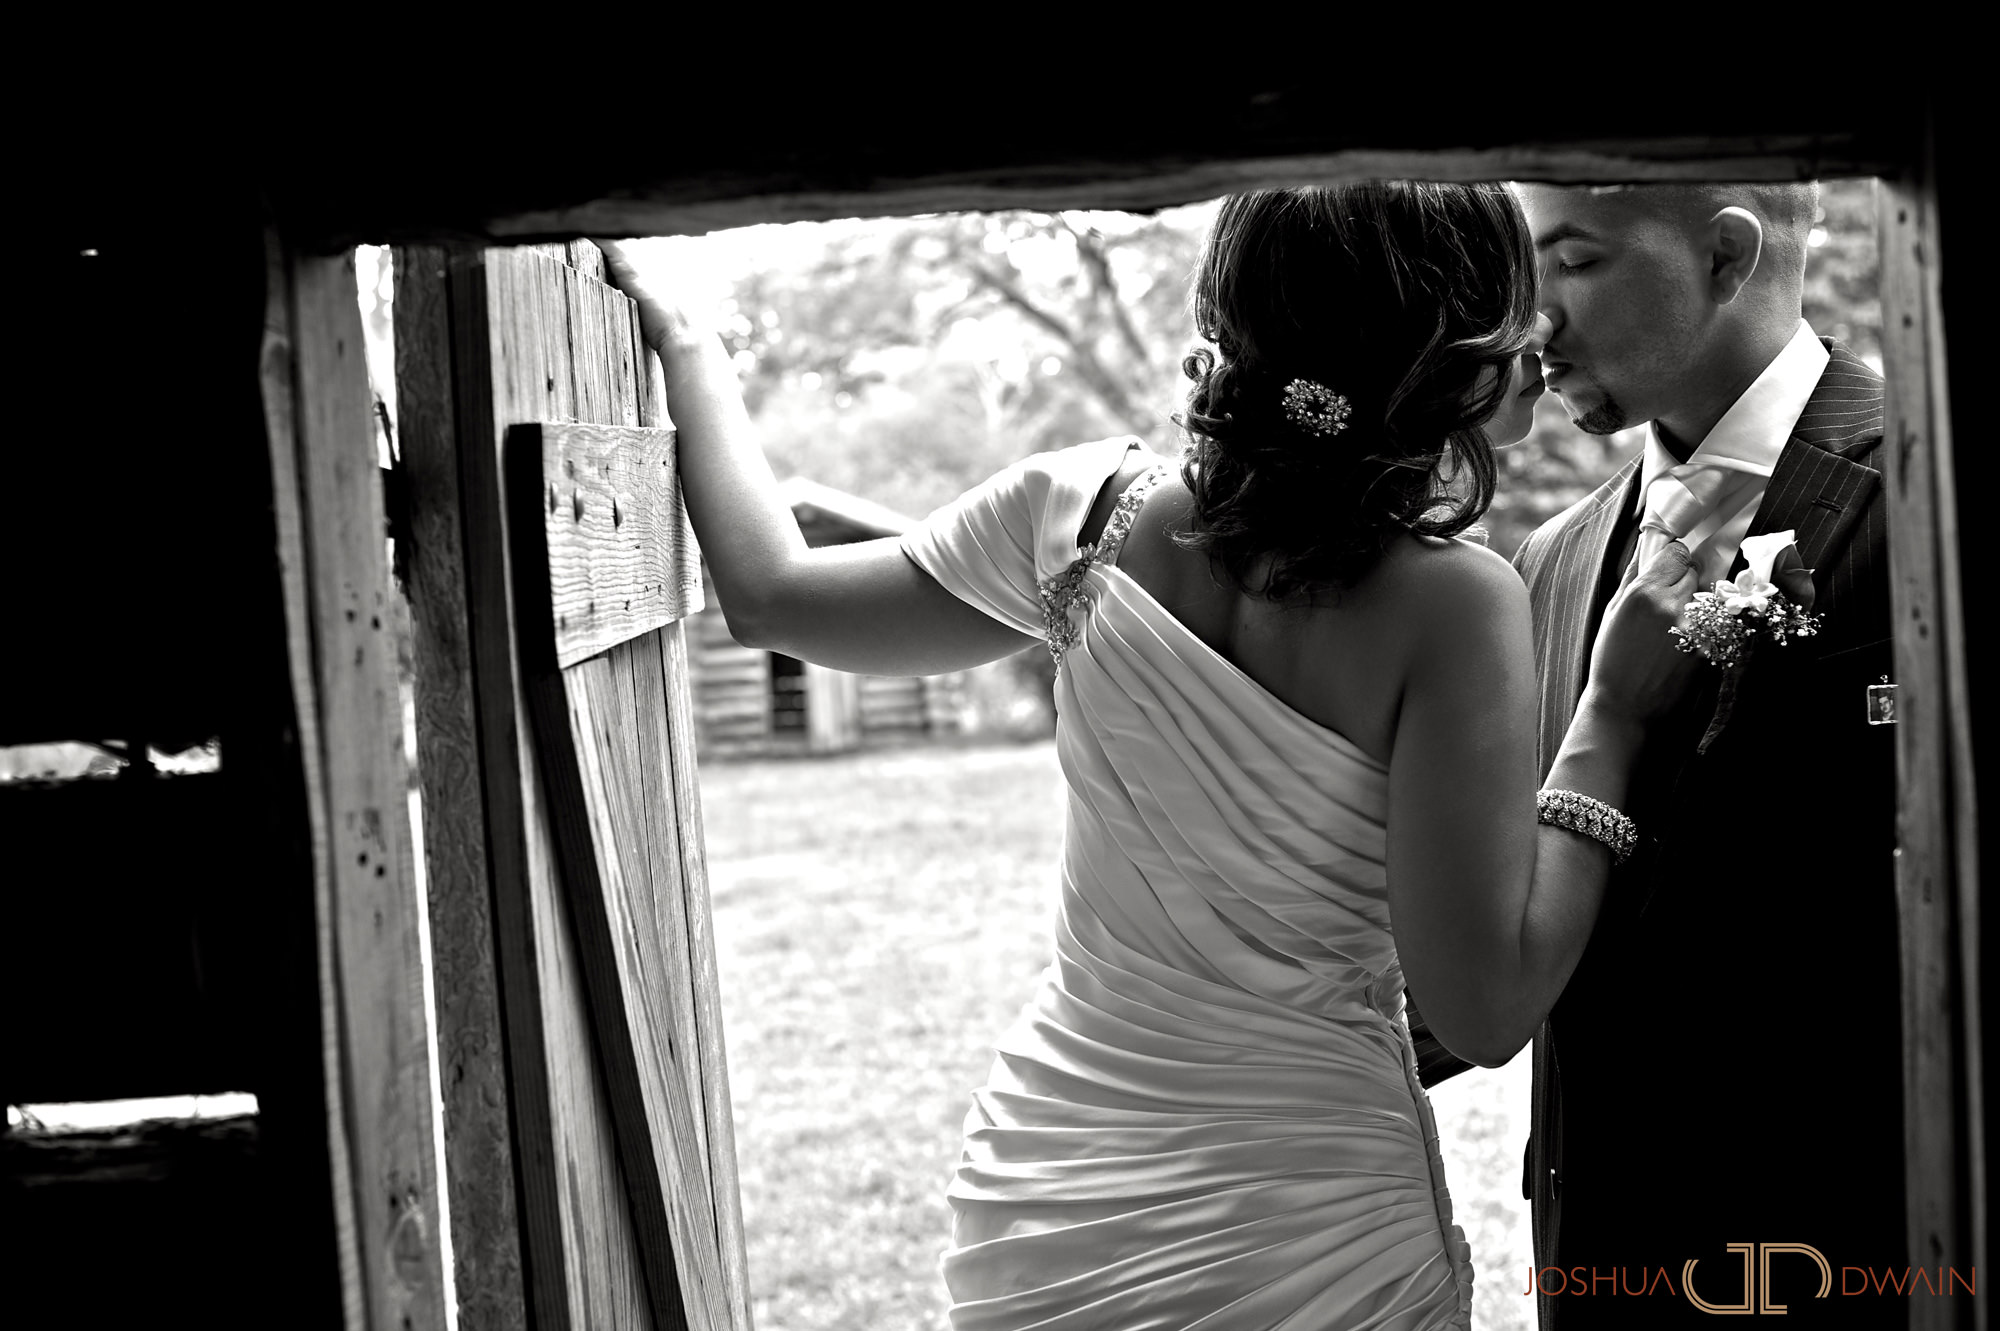 carolina-hector-019-chateau-briandlong-island-new-york-wedding-photographer-joshua-dwain-2011-05-13_ch_0480